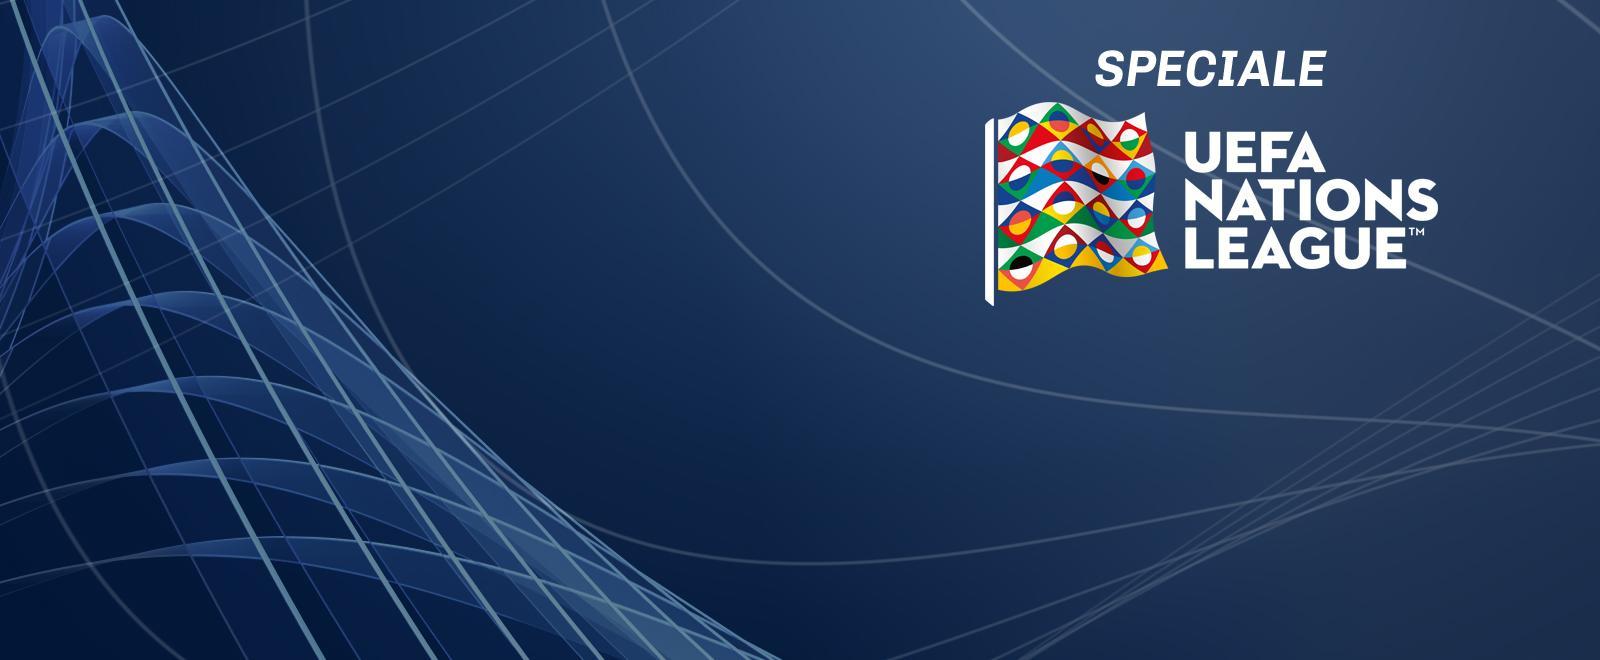 Preview uefa nations league